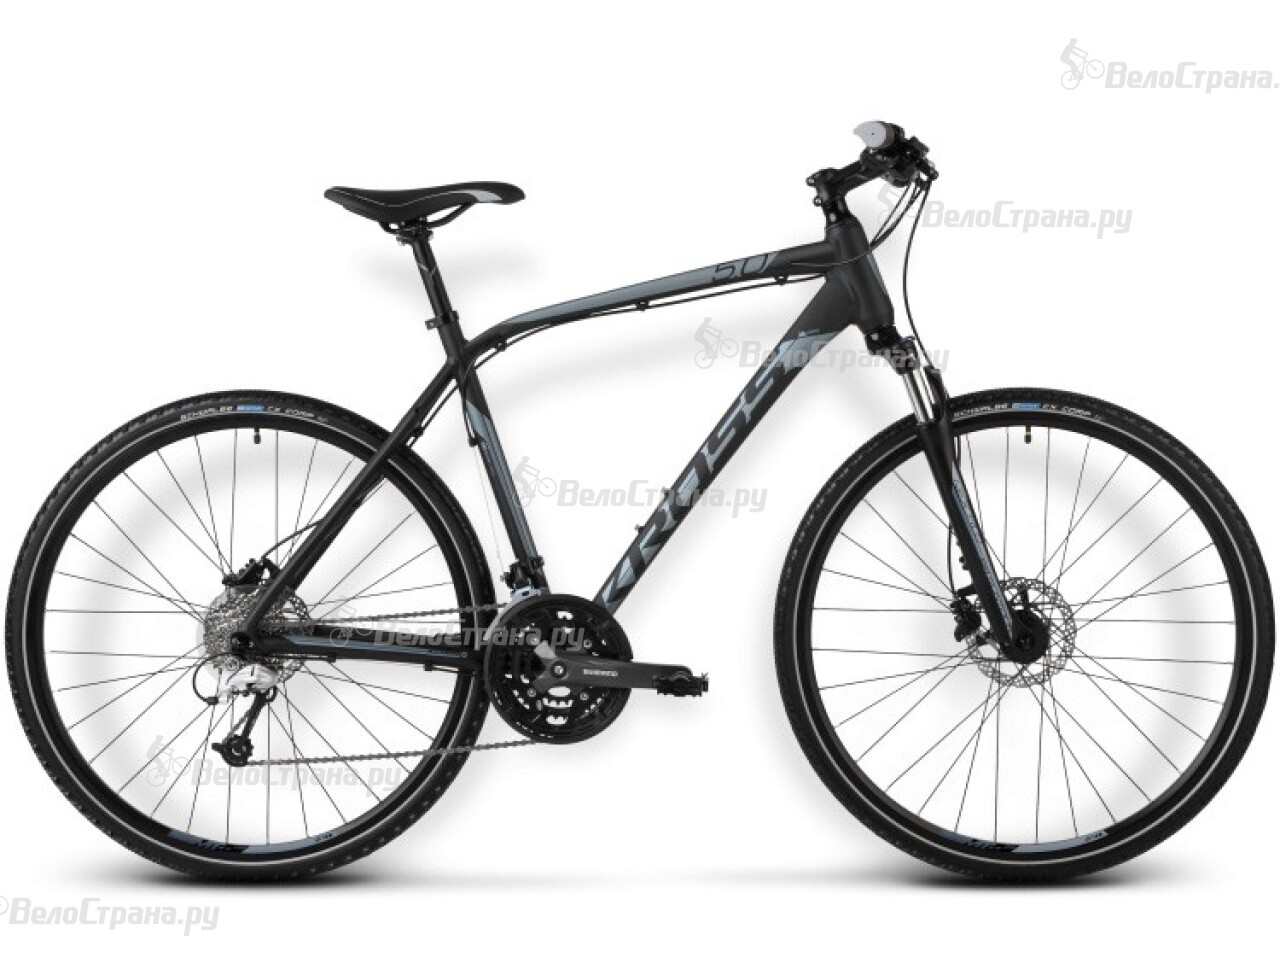 Велосипед Kross EVADO 5.0 (2016) велосипед kross evado 6 0 2016